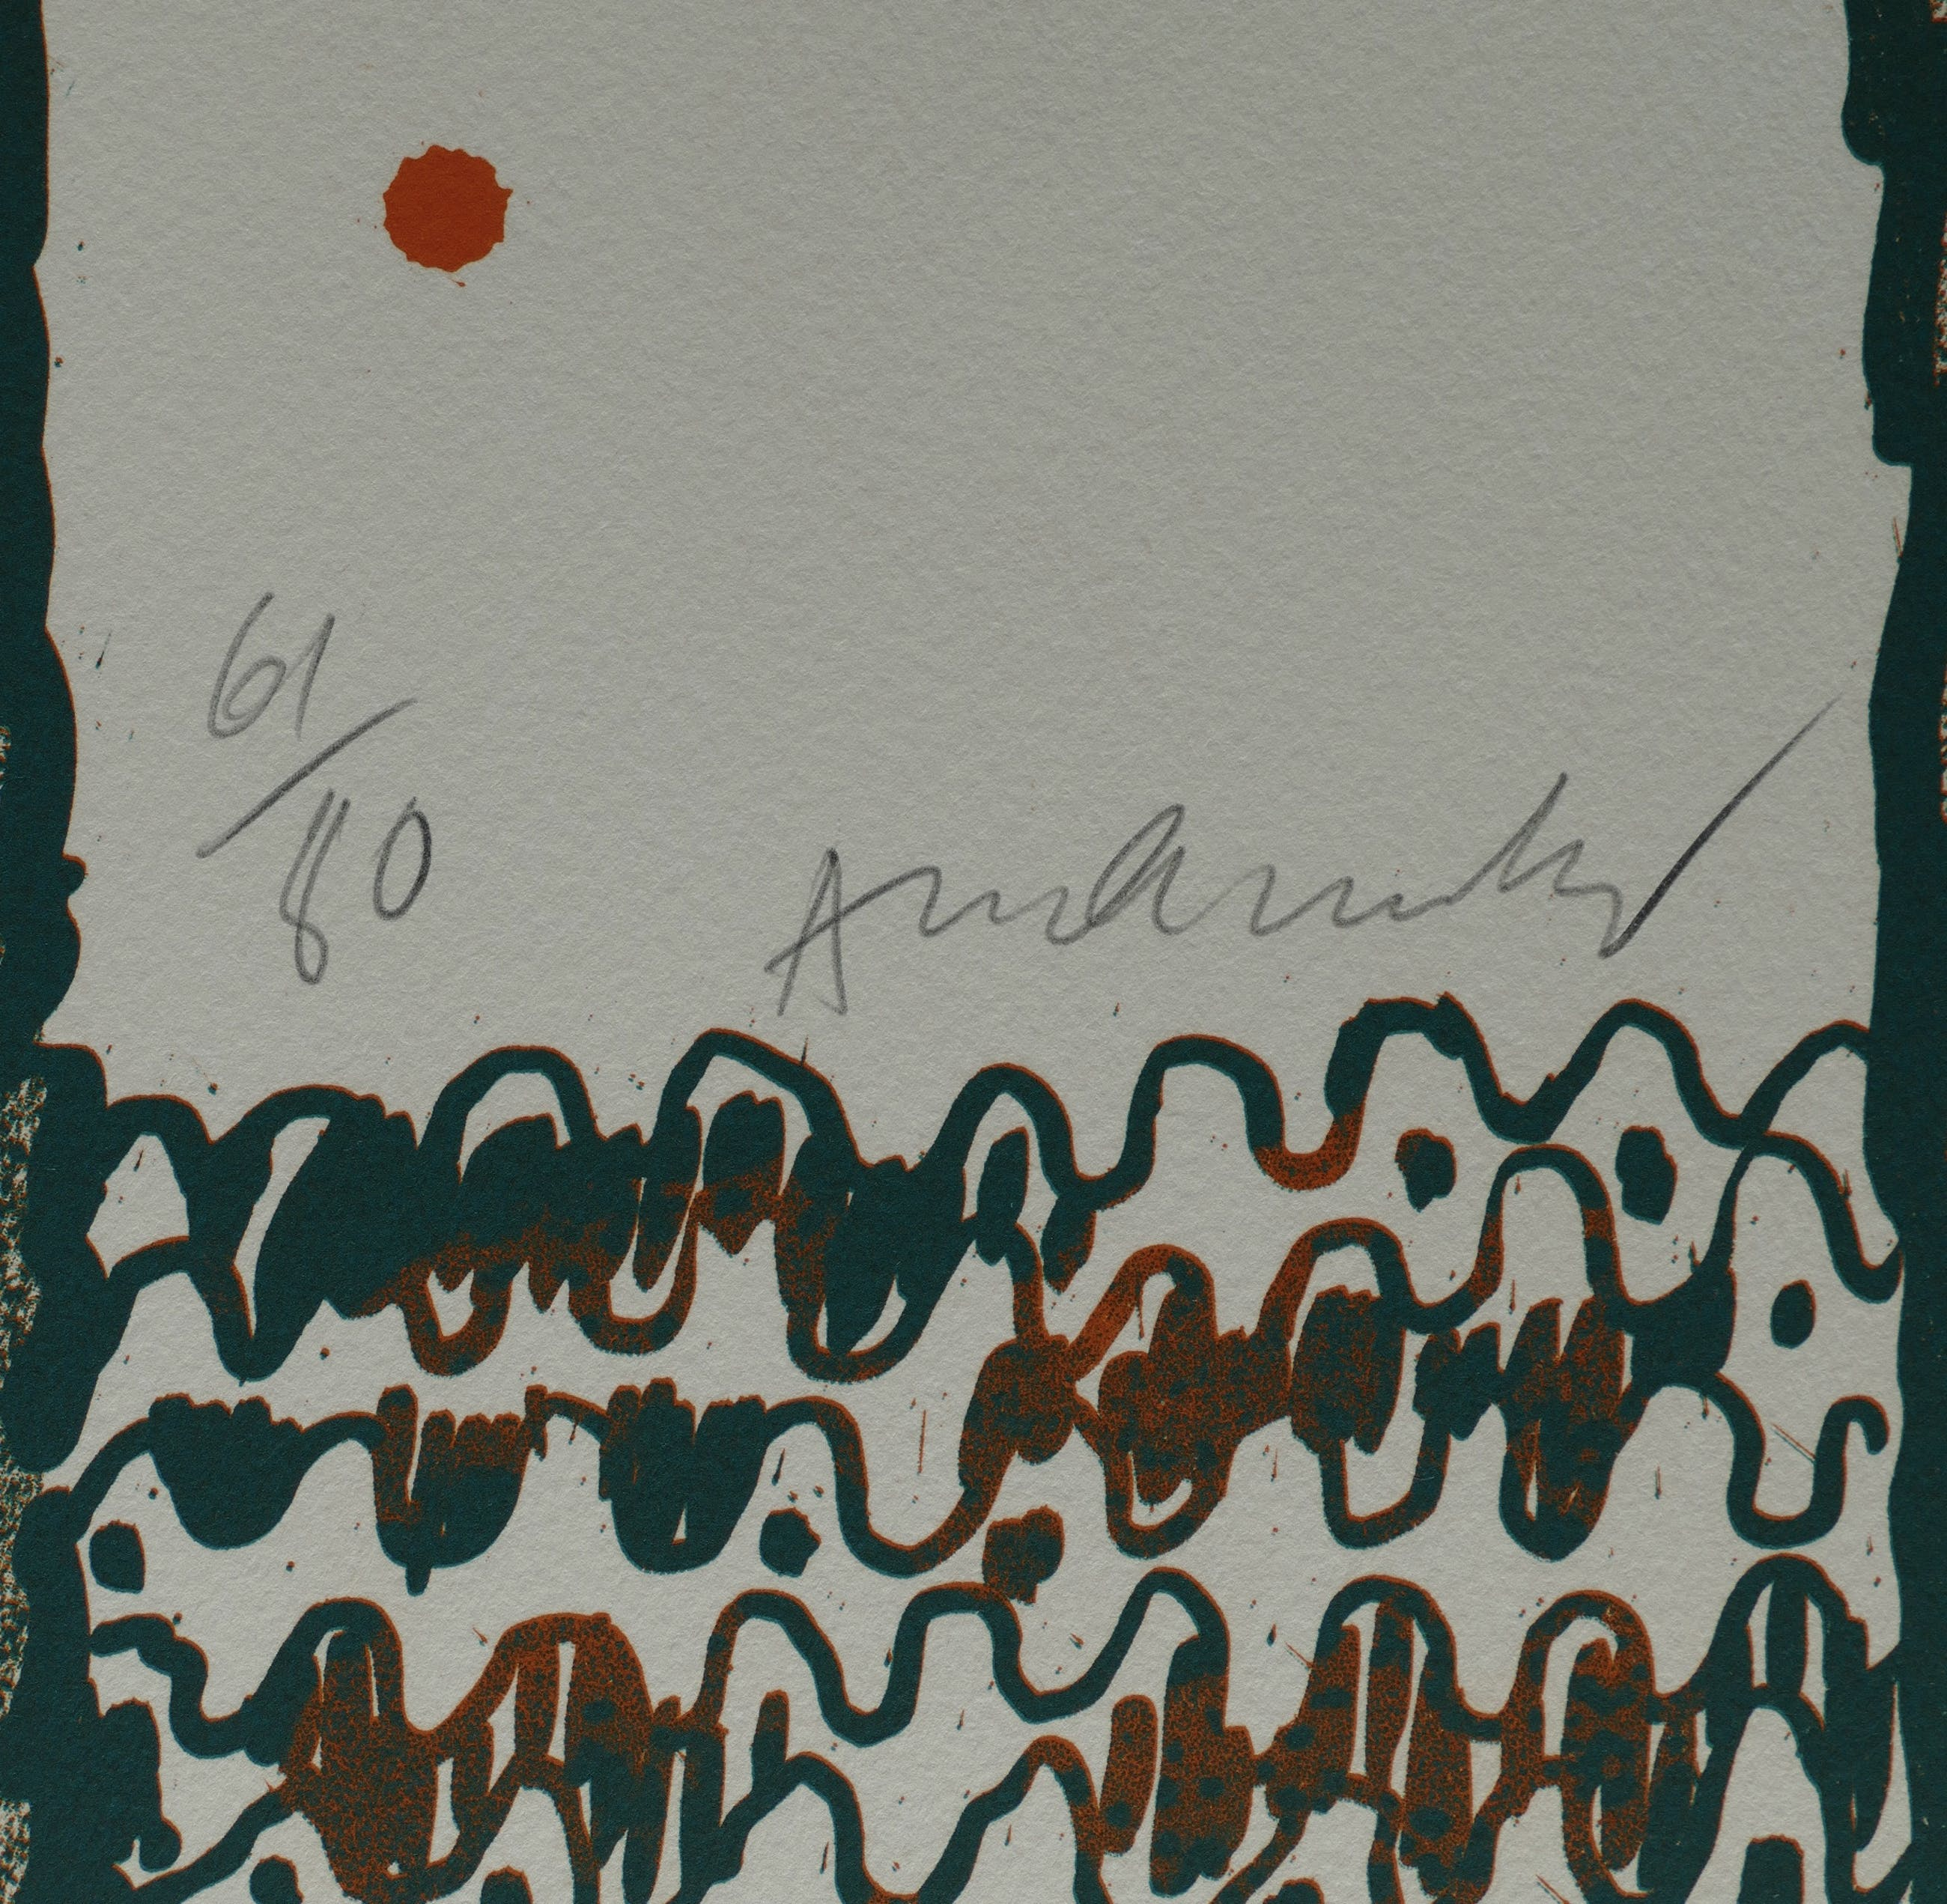 Pierre Alechinsky - handsignierte Lithographie kopen? Bied vanaf 750!